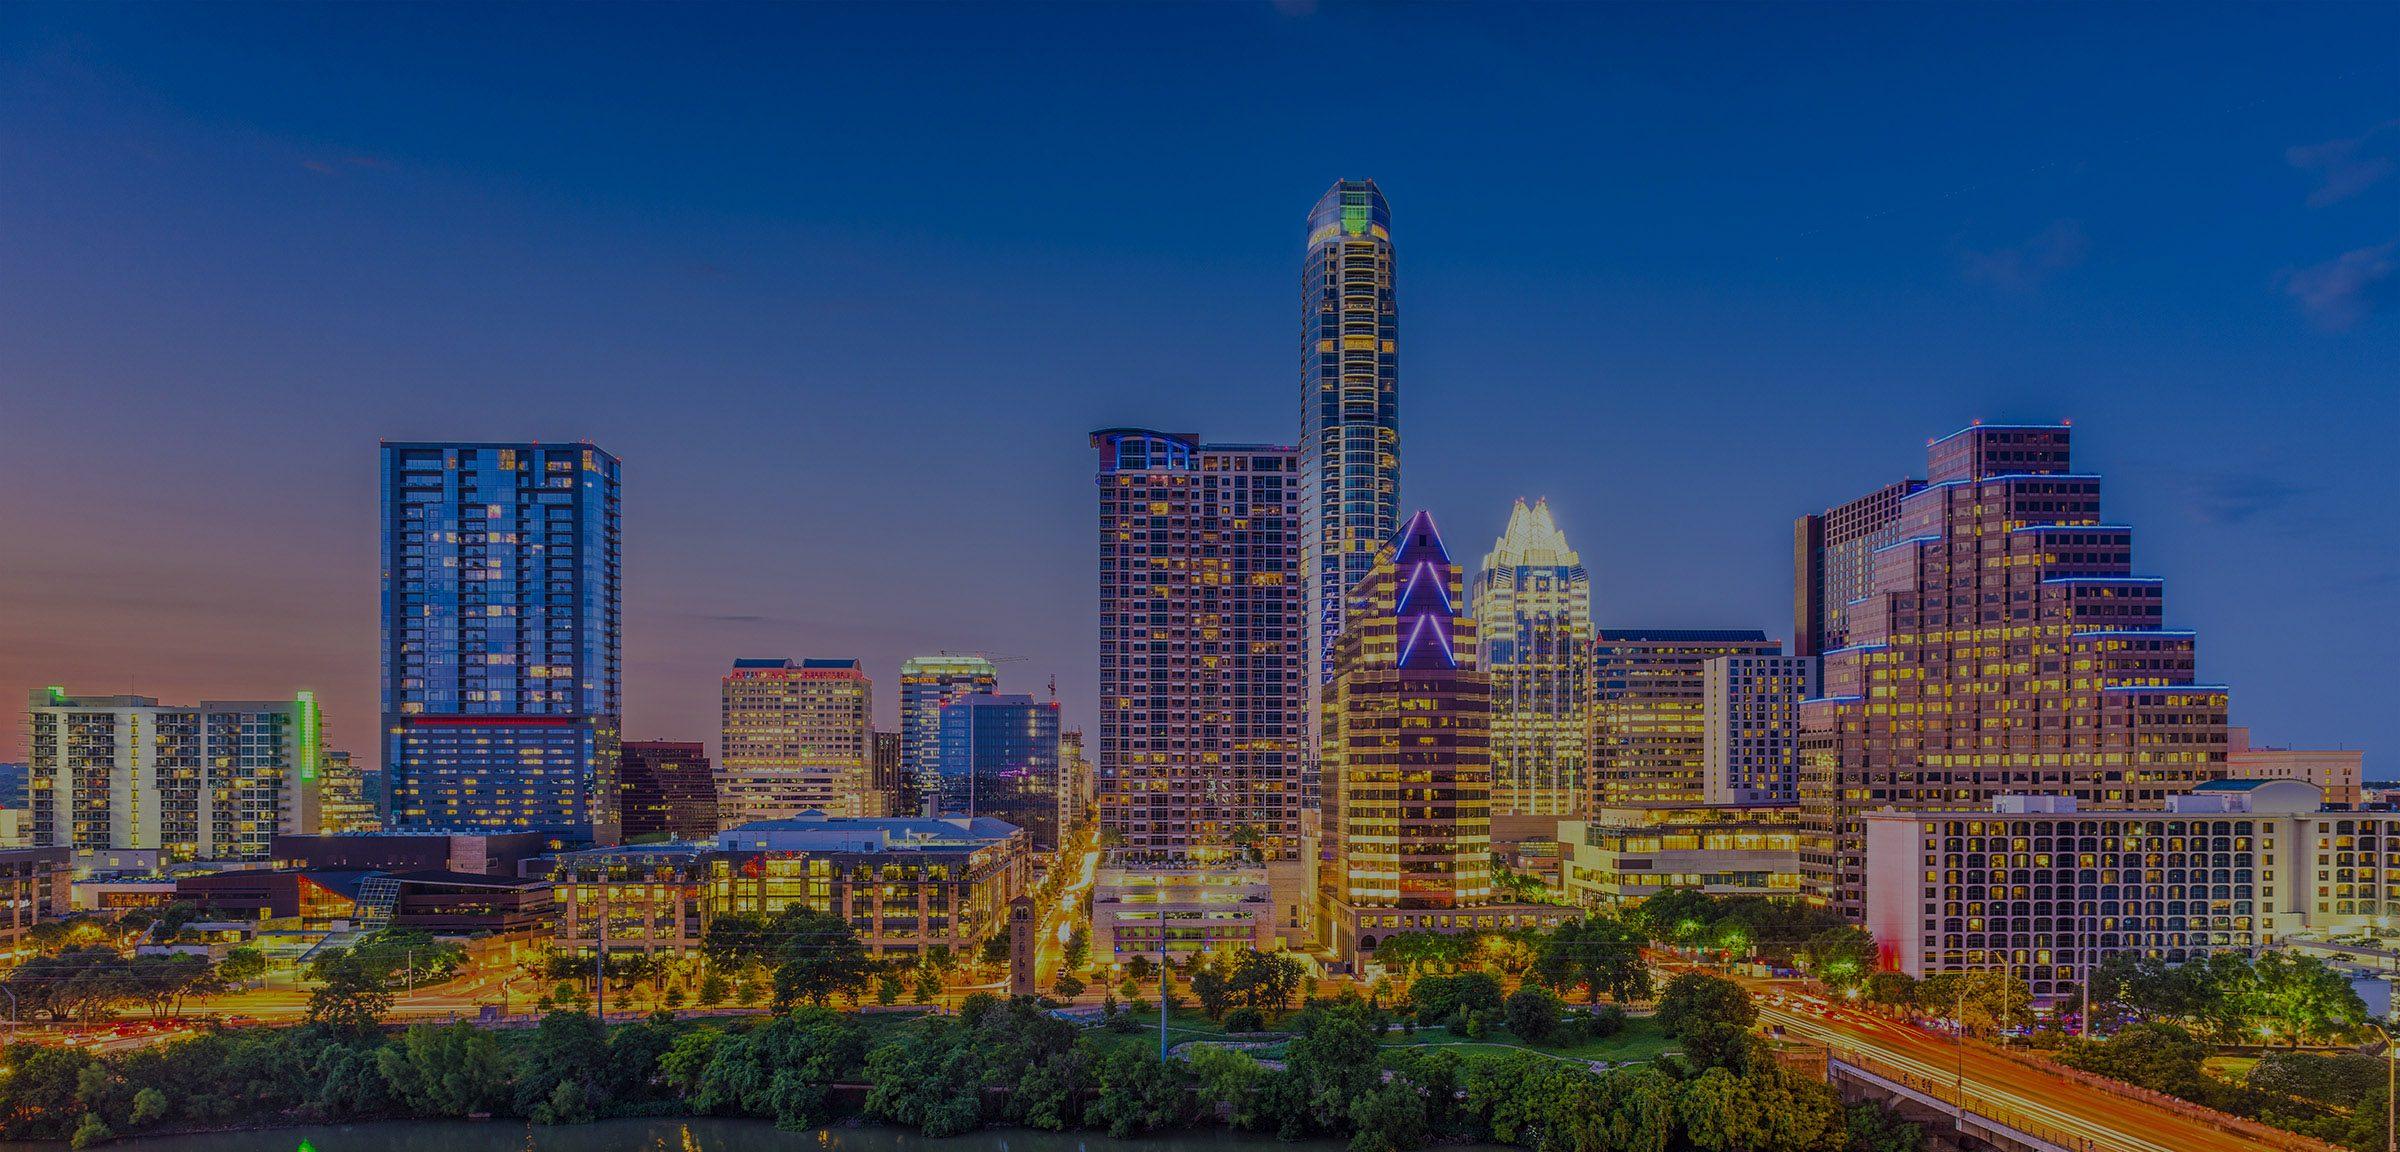 Austin Skyline image